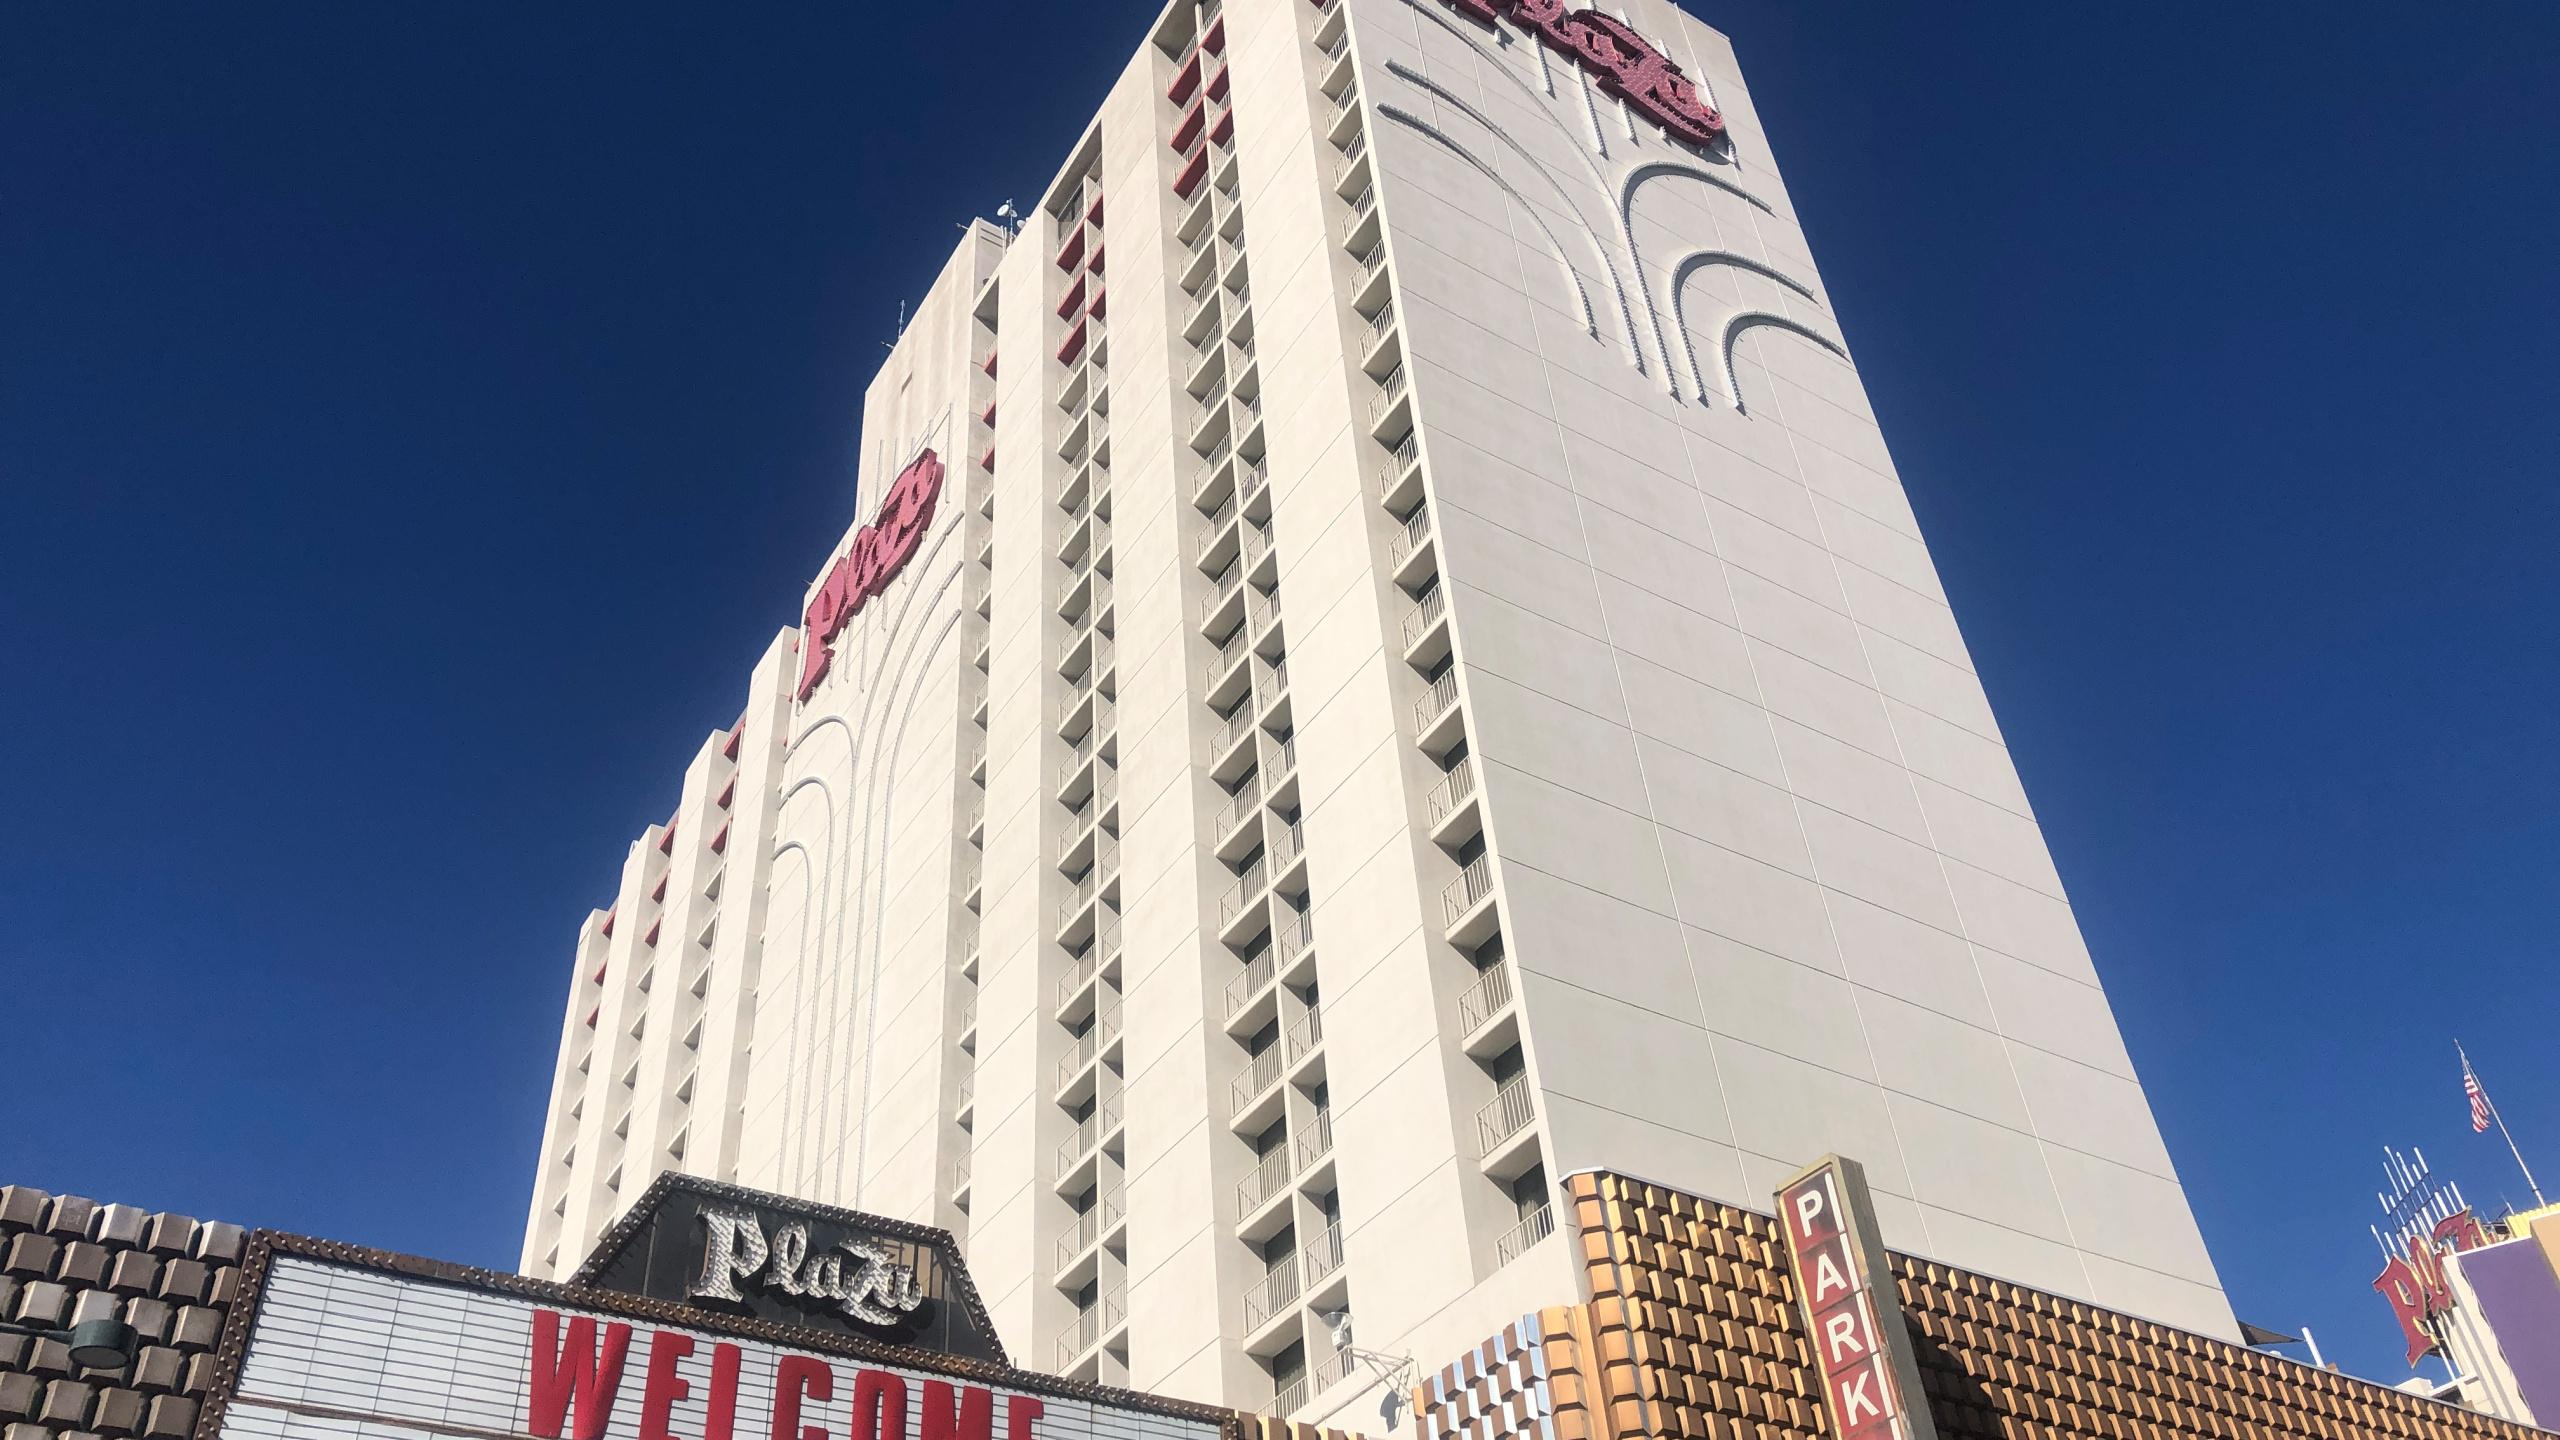 Casino klas casino gaming advisory board